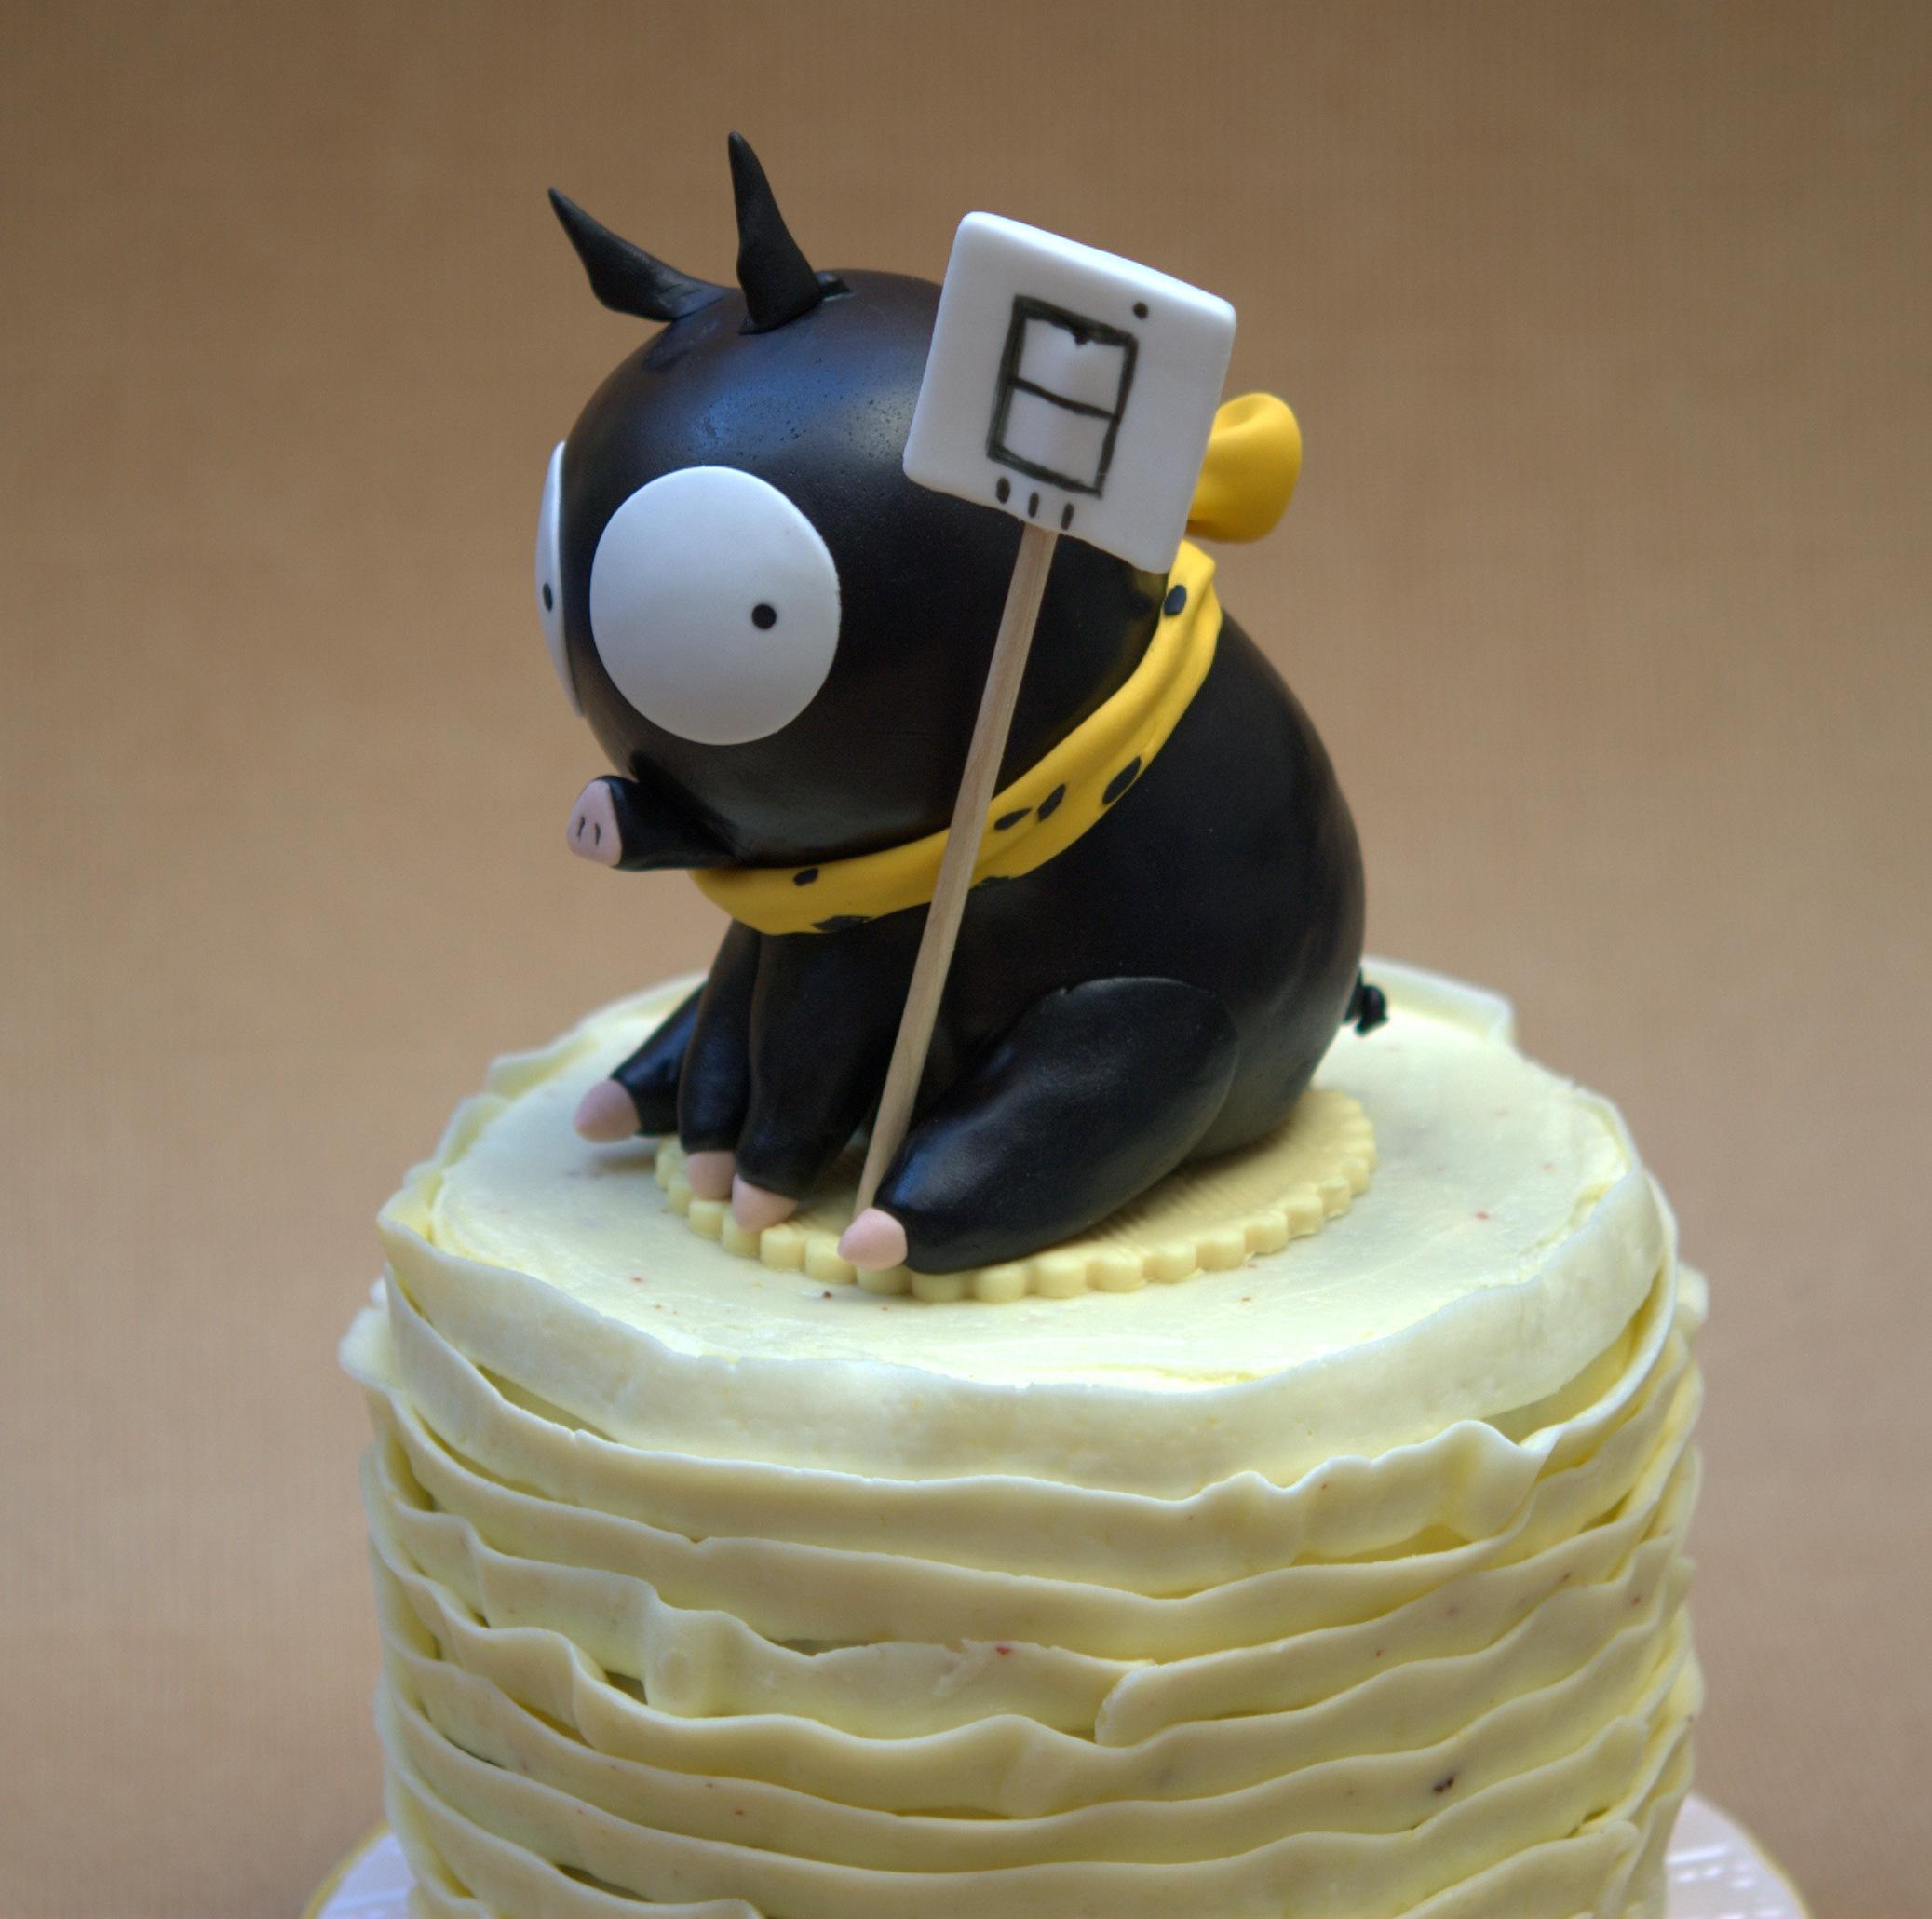 Joyeux anniversaire Akane chan ! Ryoga-Pchan-Ranma-Rumiko-Takahashi-Vacunet-Anime-cake-tarta-Mericakes-Layer-cake-Barcelona-sugarcraft-ruffle.jpeg-2